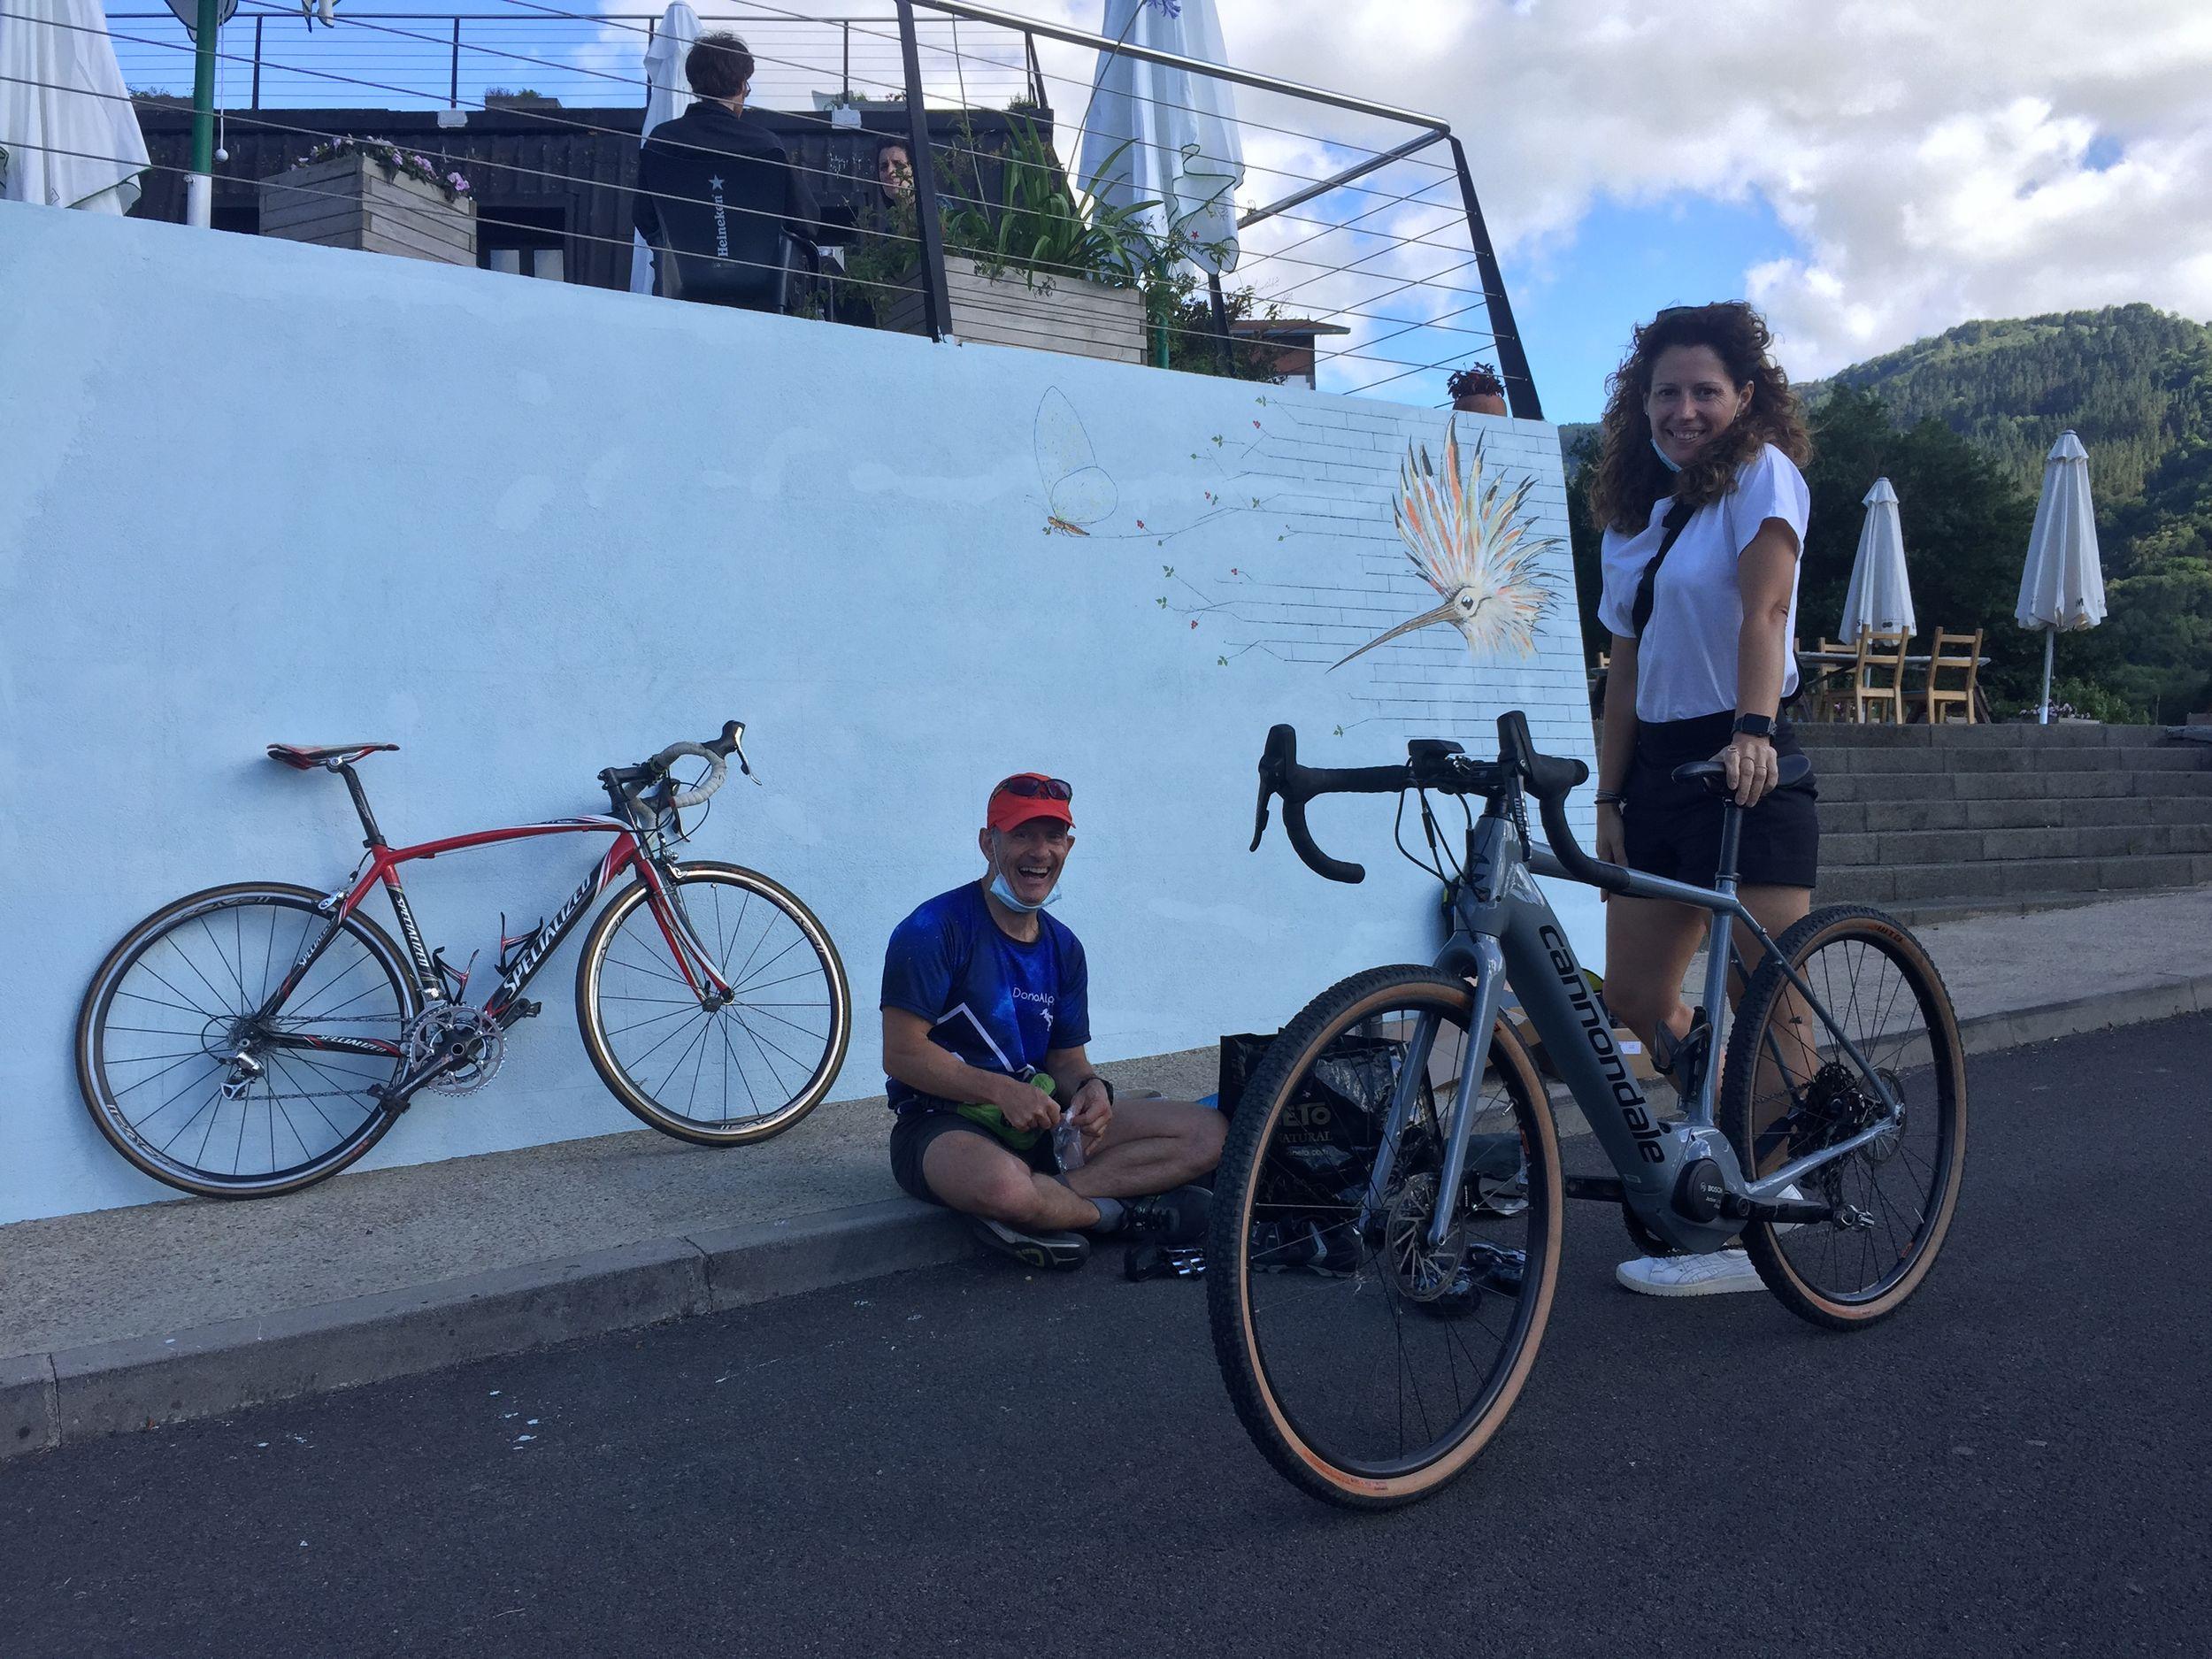 cicloturismo-bikefriendly-abaraxka-Pais-Vasco1